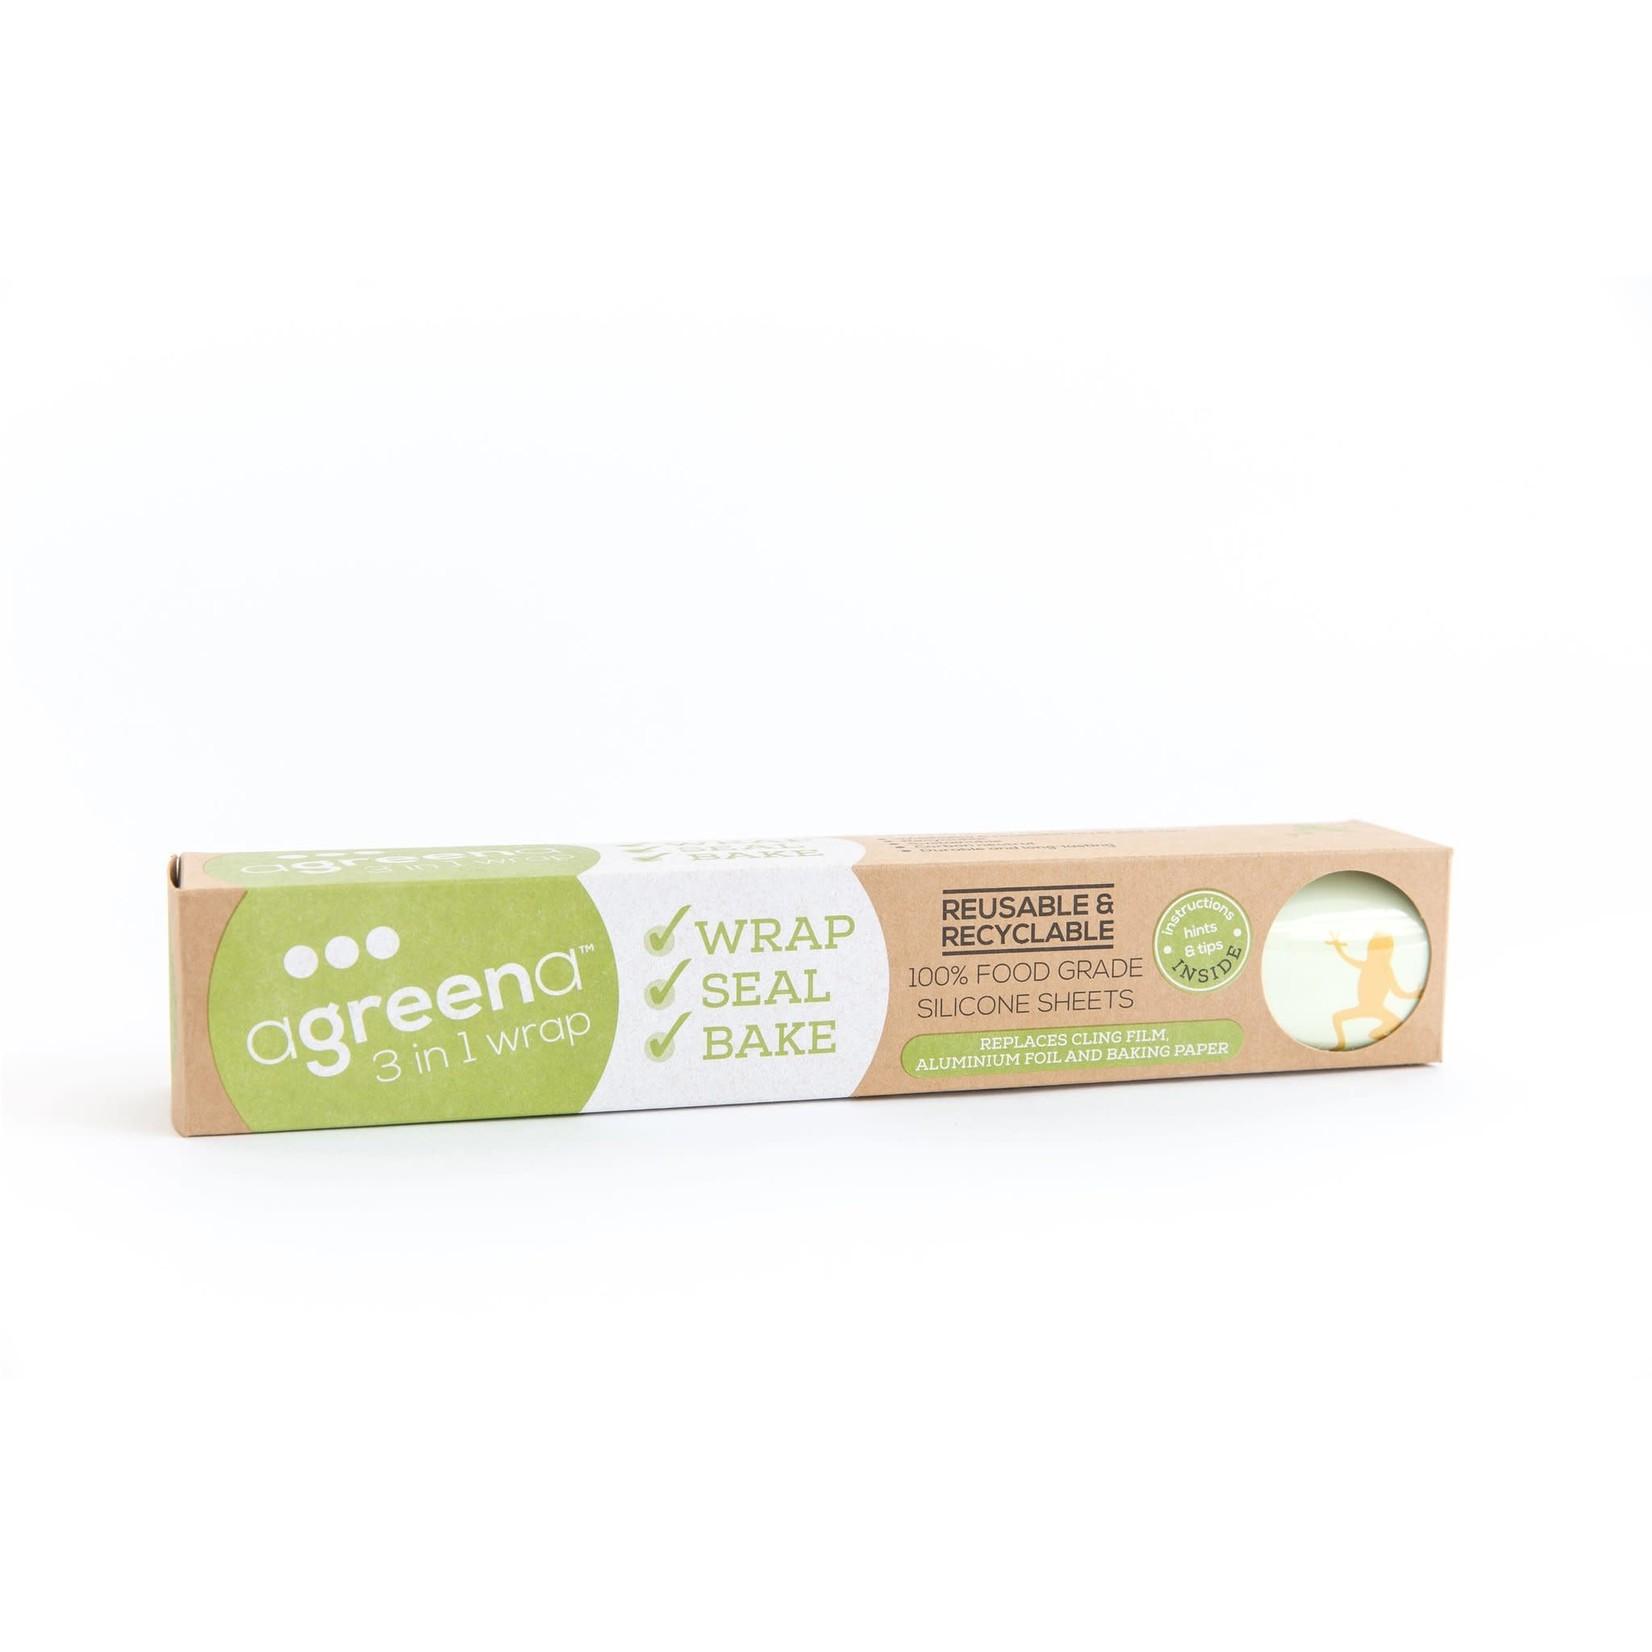 Agreena Agreena Wraps 4 Pack